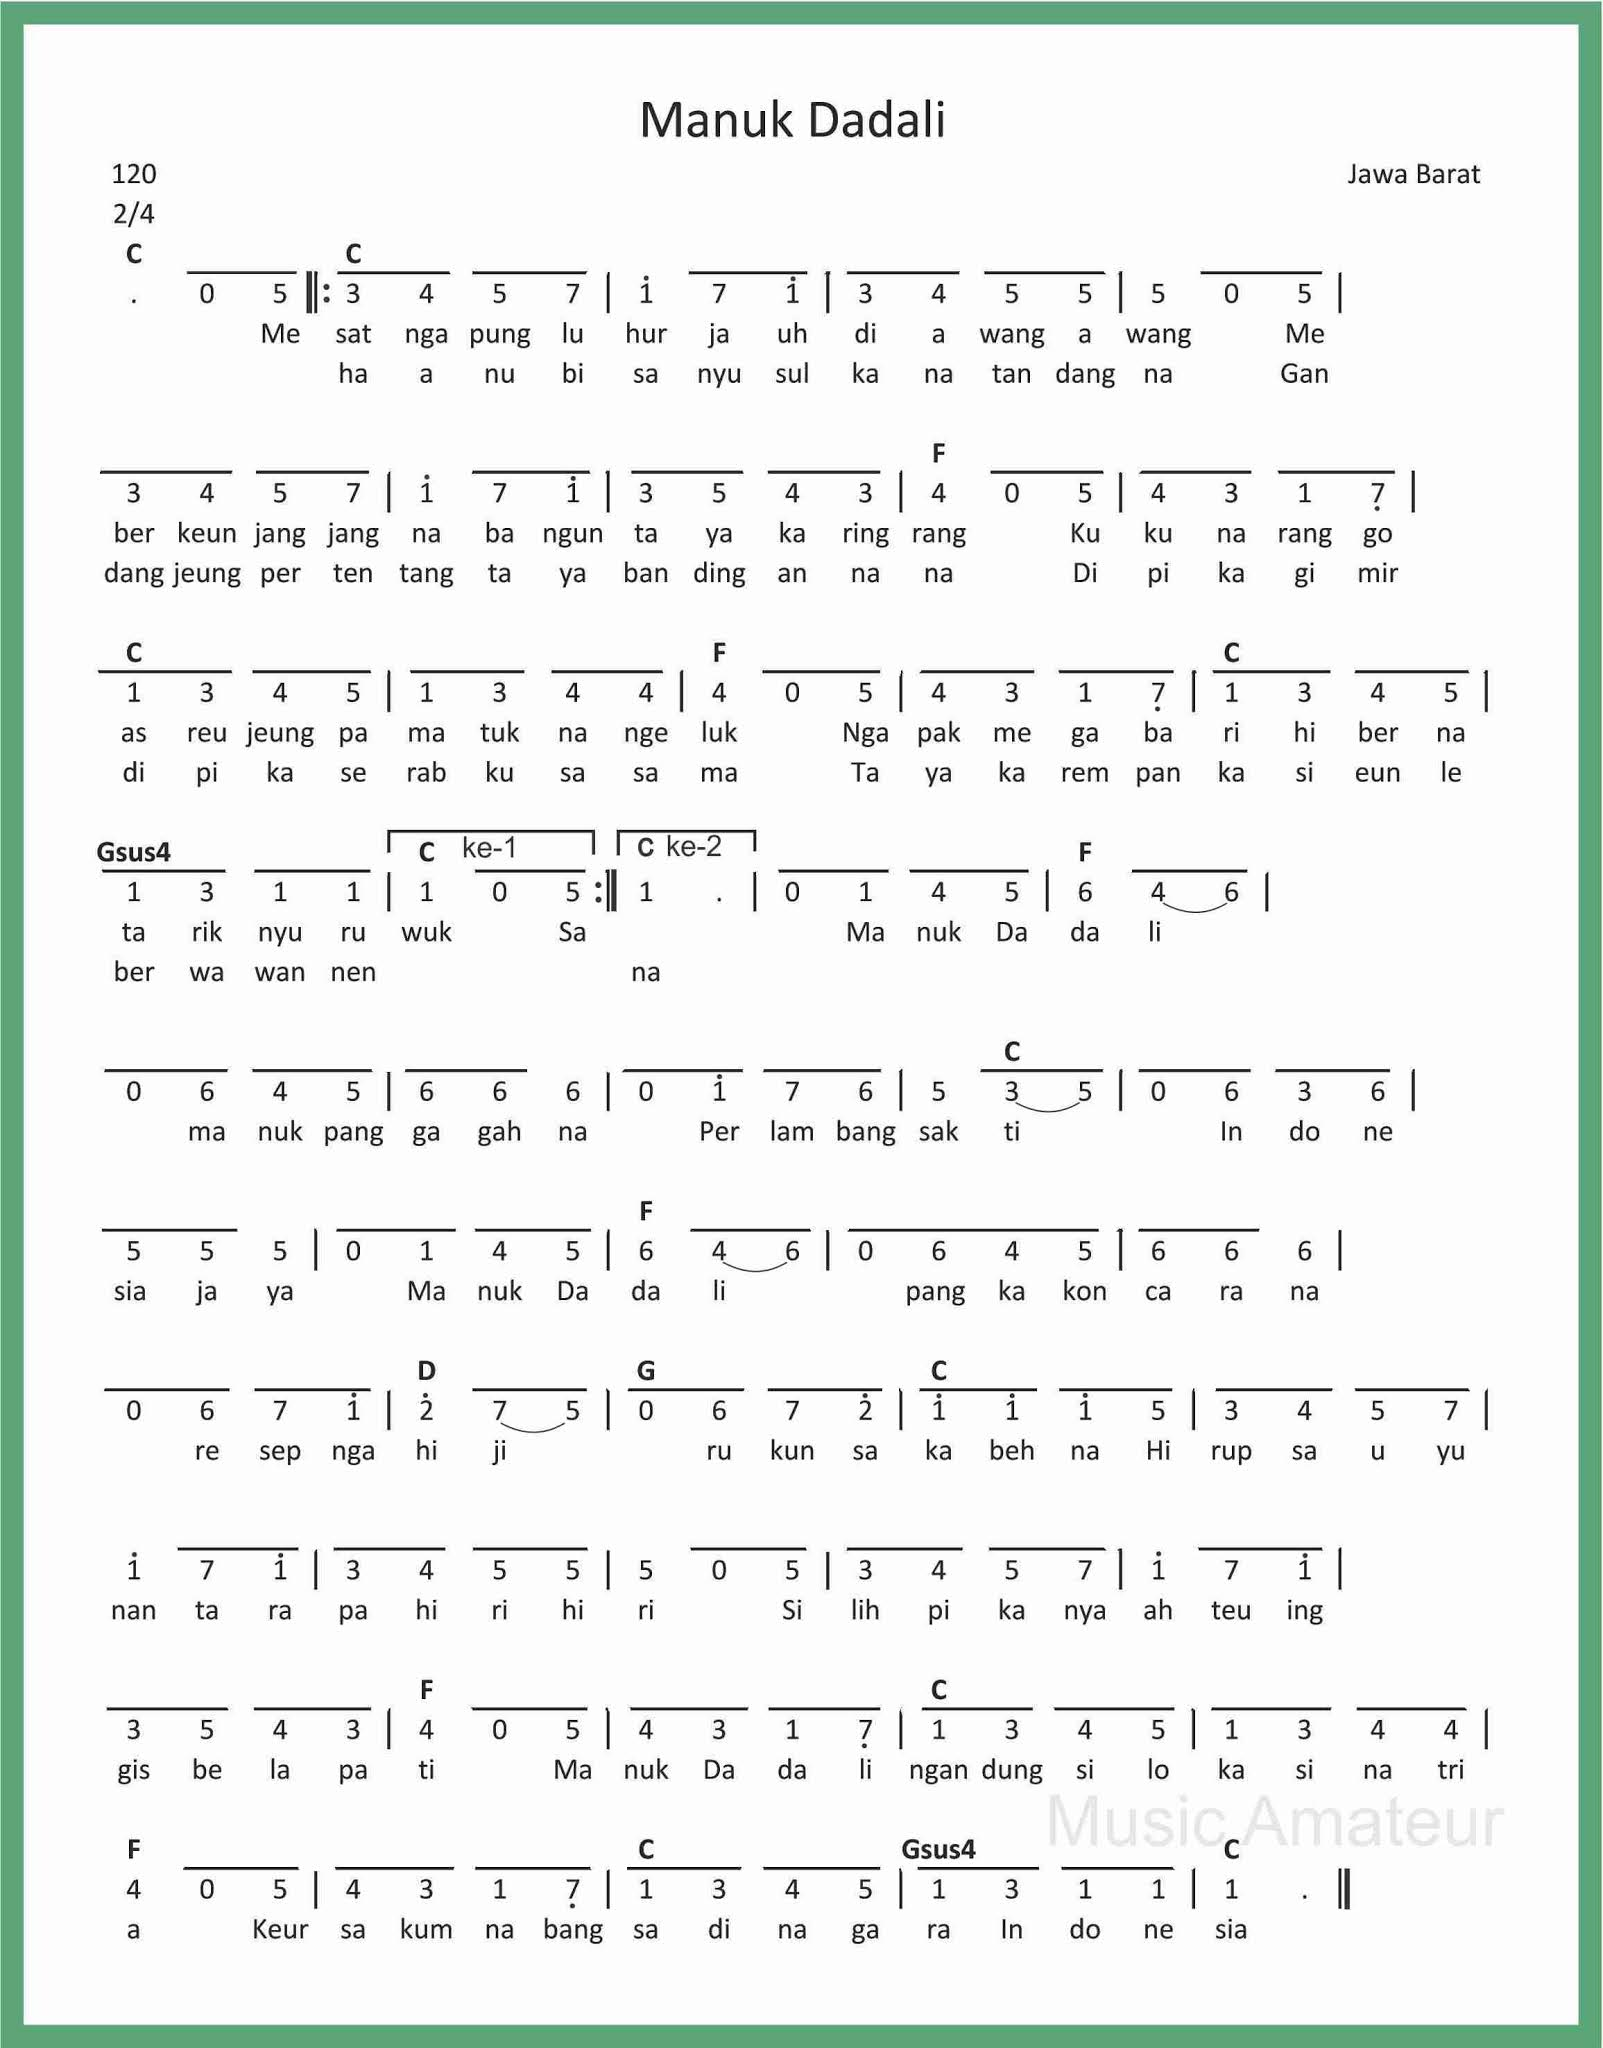 Not Pianika Manuk Dadali : pianika, manuk, dadali, Angka, Manuk, Dadali, SEPUTAR, MUSIK